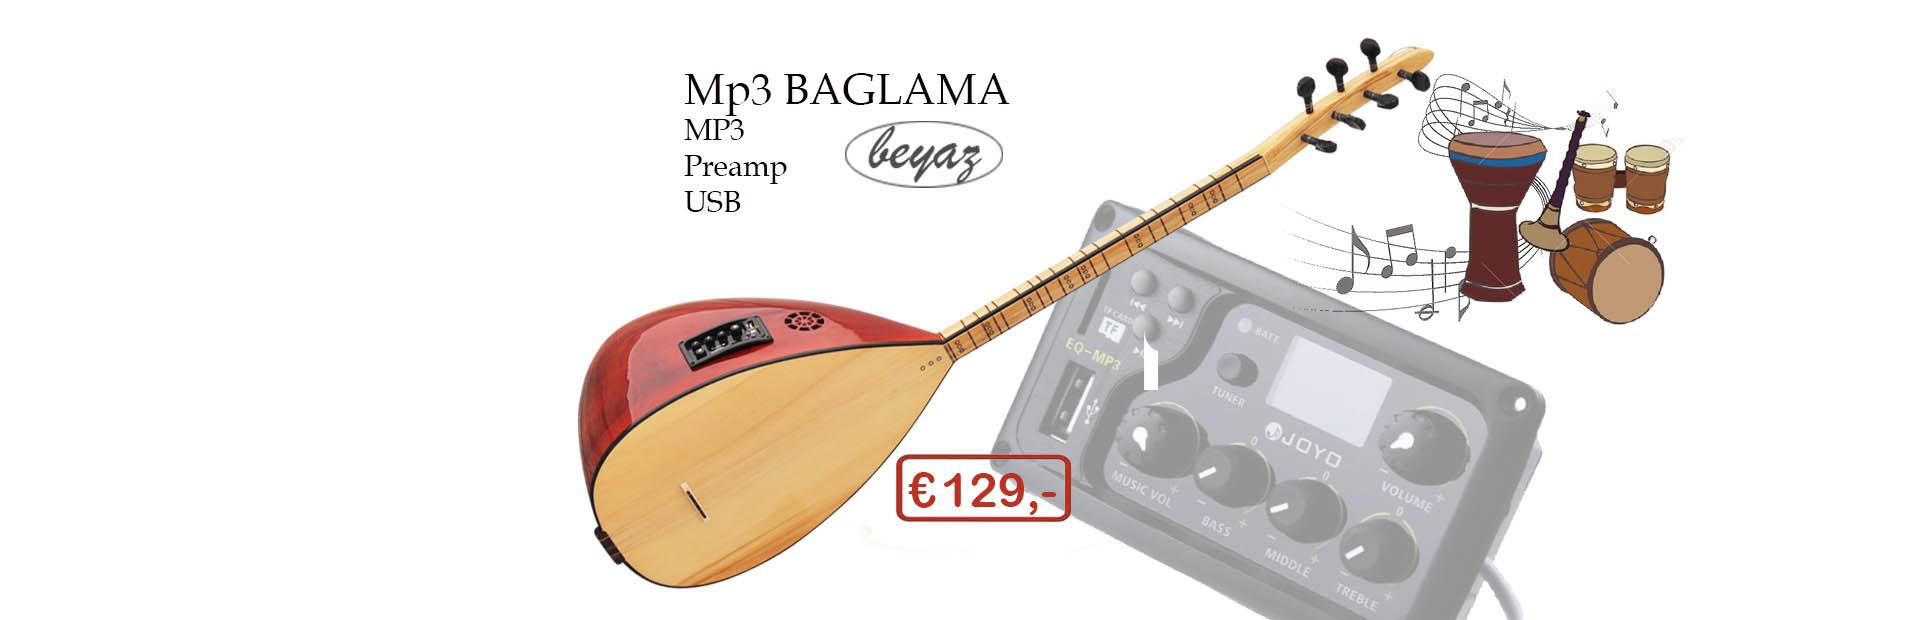 E SAZ  MP3 Joyo USB Ritimli Orkestra Tek basina